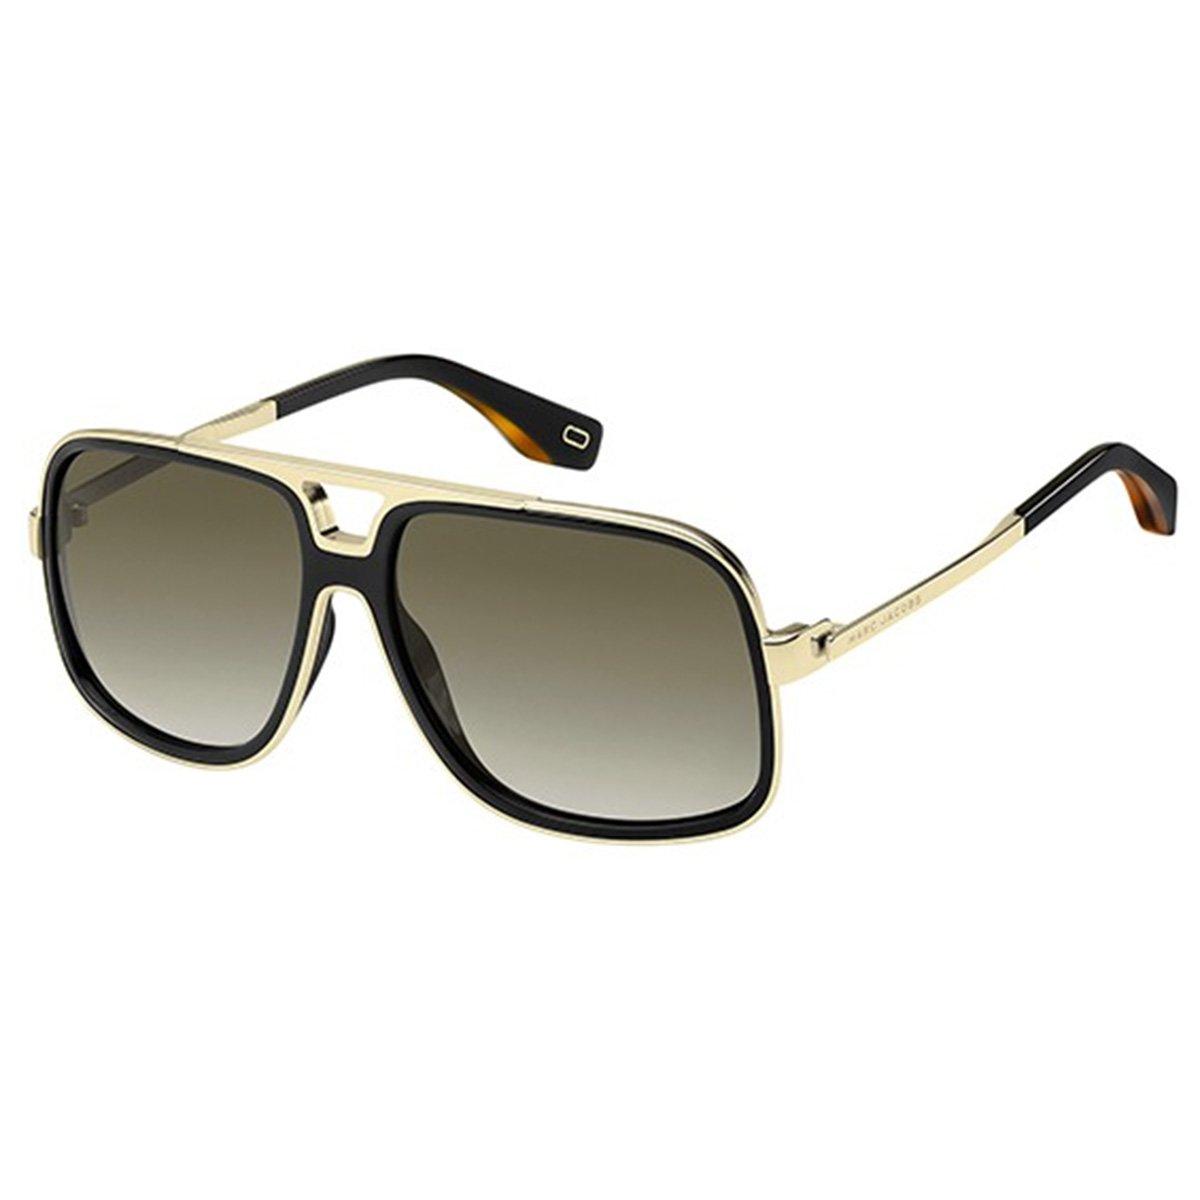 52f4e2f8c Compre Óculos de Sol Marc Jacobs em 10X   Tri-Jóia Shop